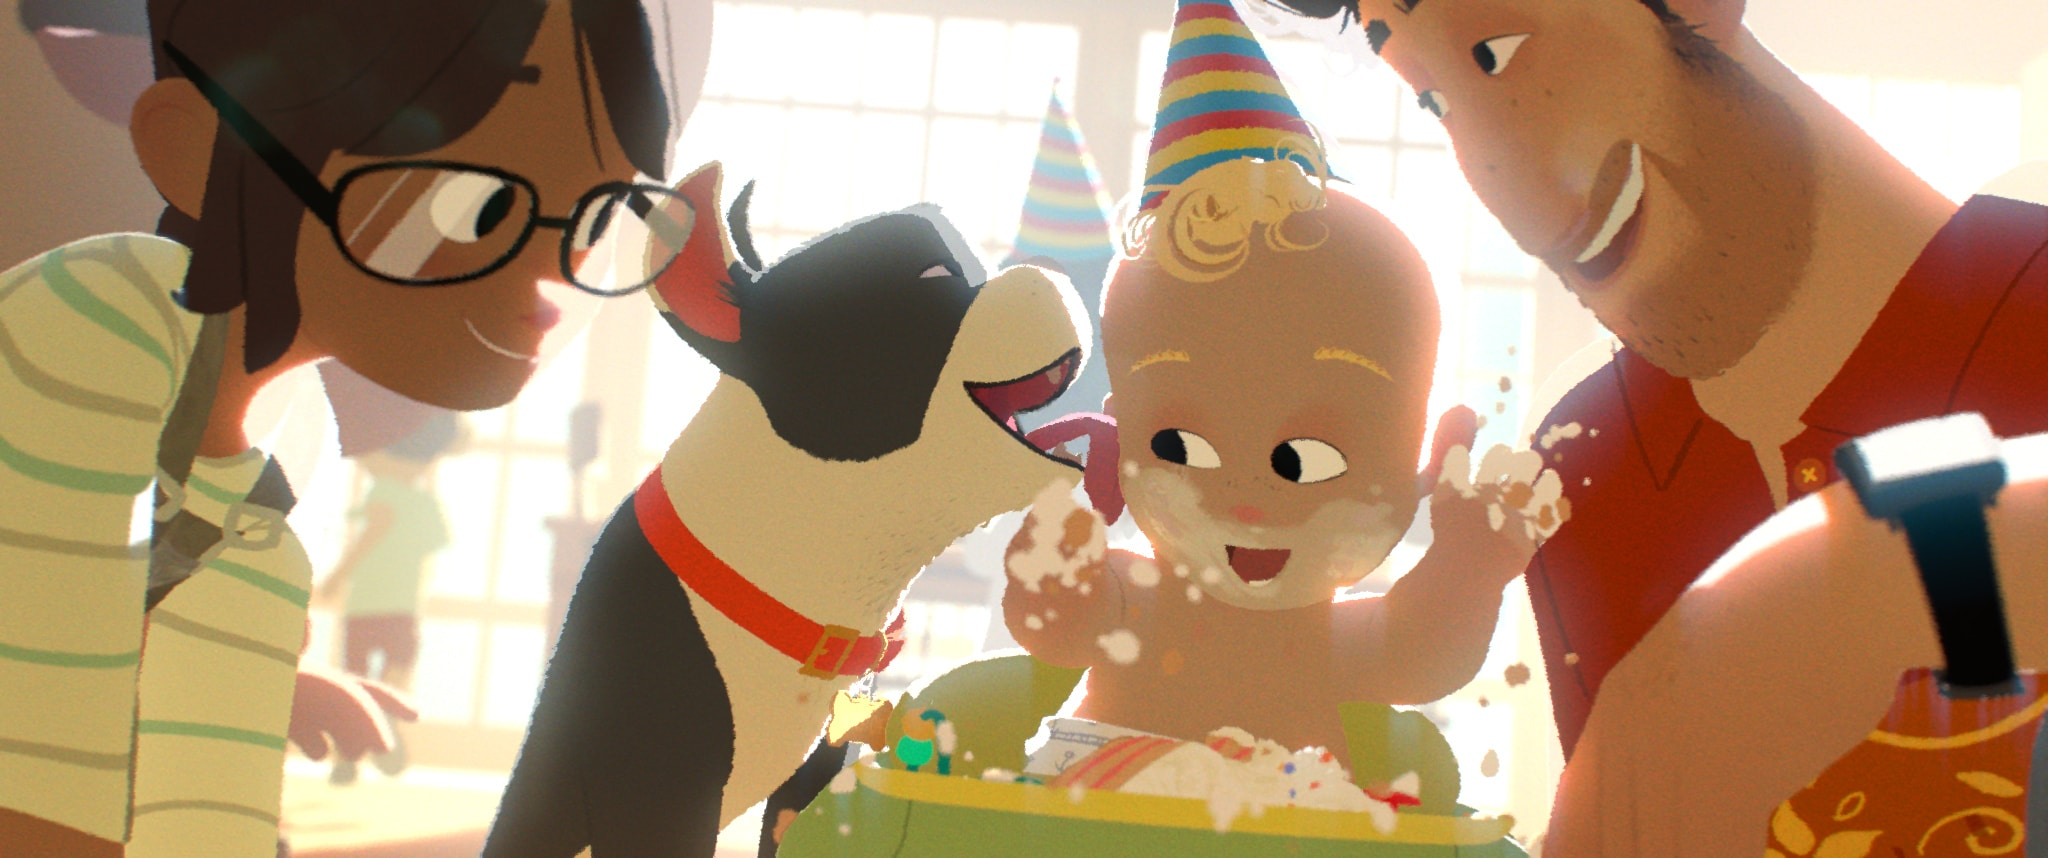 Feast - Walt Disney Animation Studios Short Films Collection